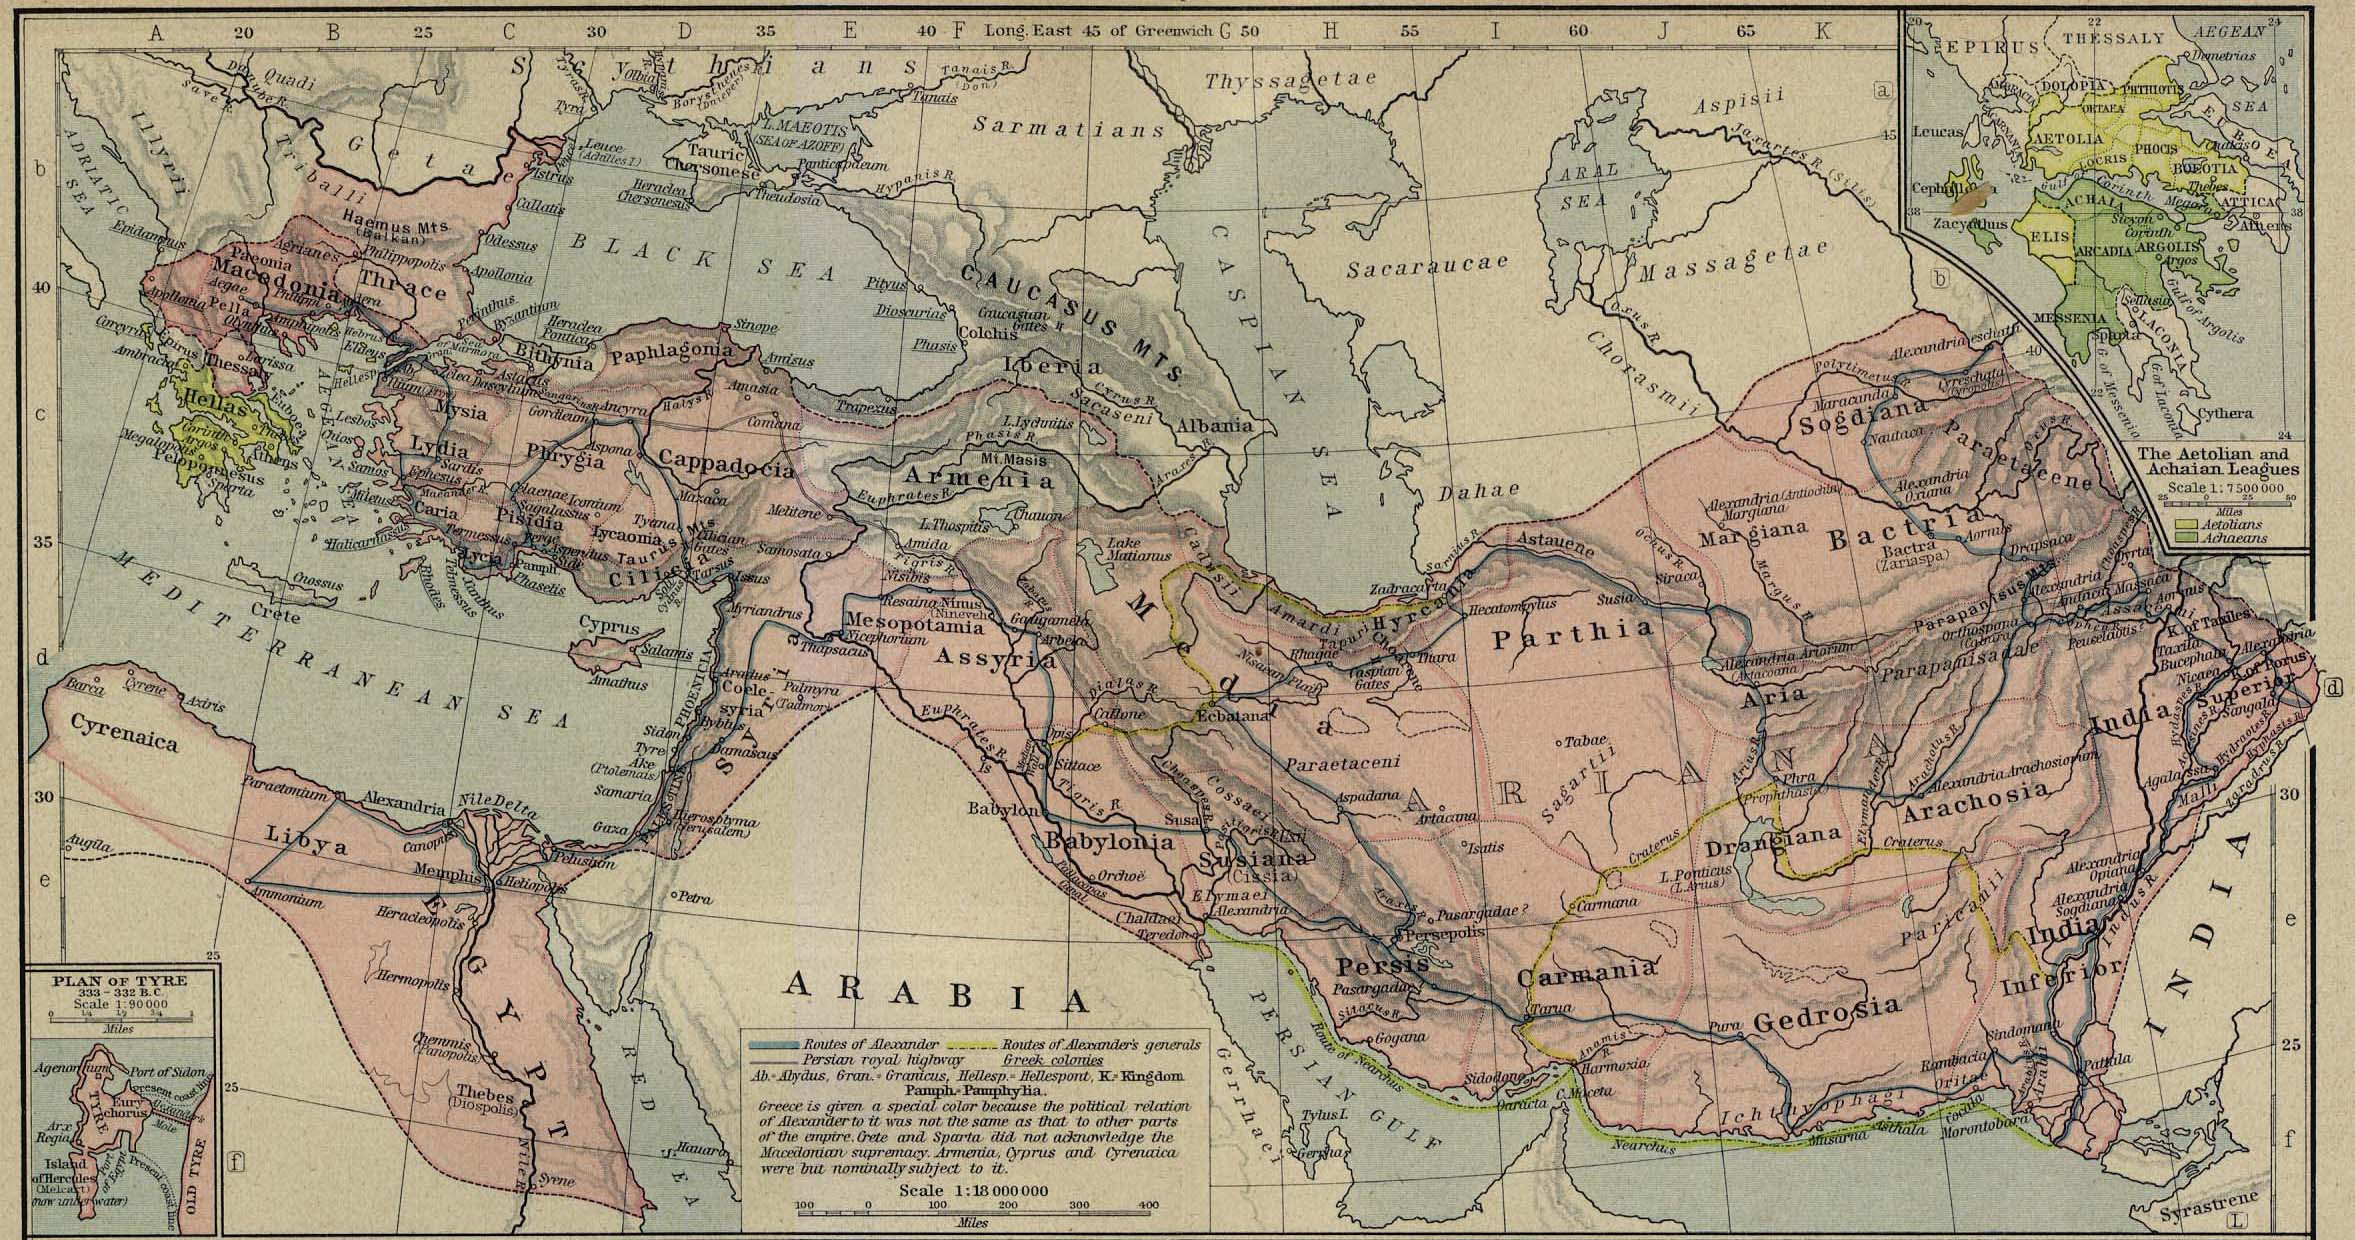 http://www.lib.utexas.edu/maps/historical/shepherd/macedonian_empire_336_323.jpg